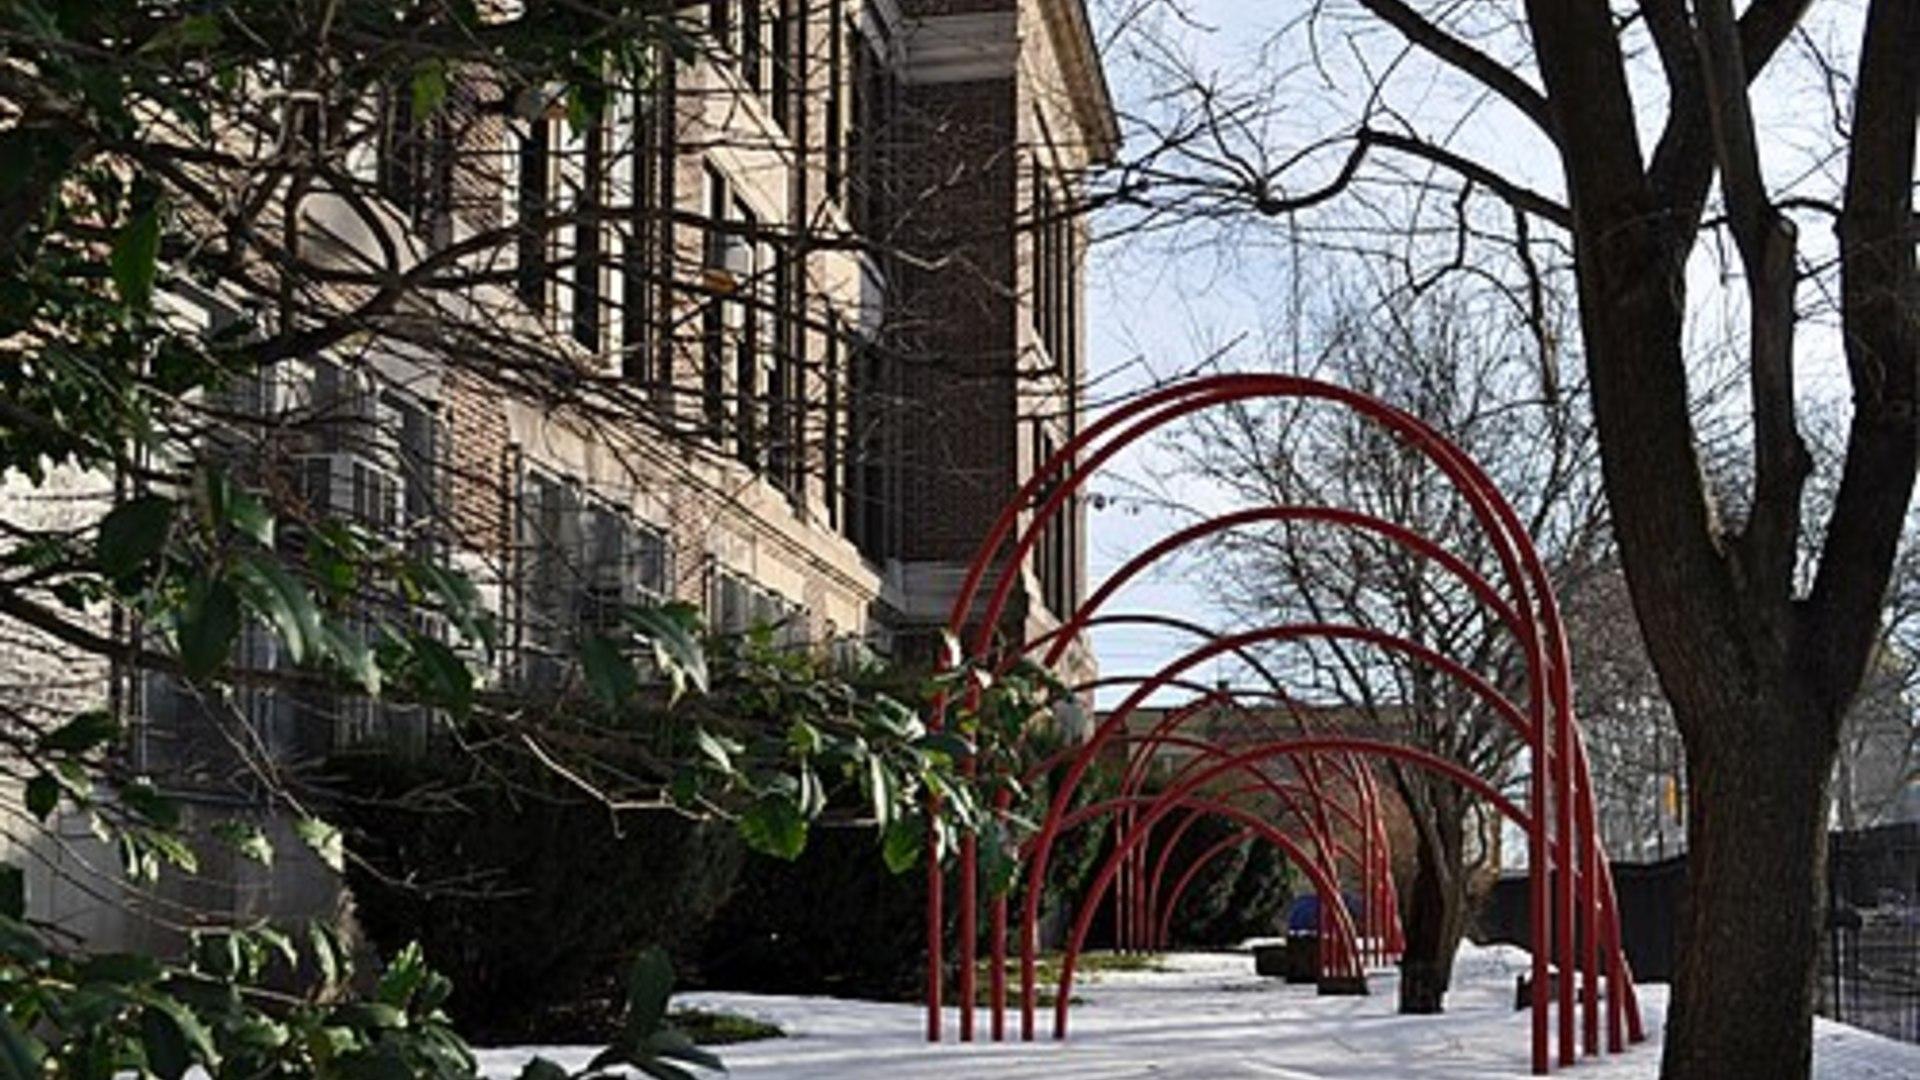 500px universal vare charter school in winter 2100 s 24th st philadelphia pa